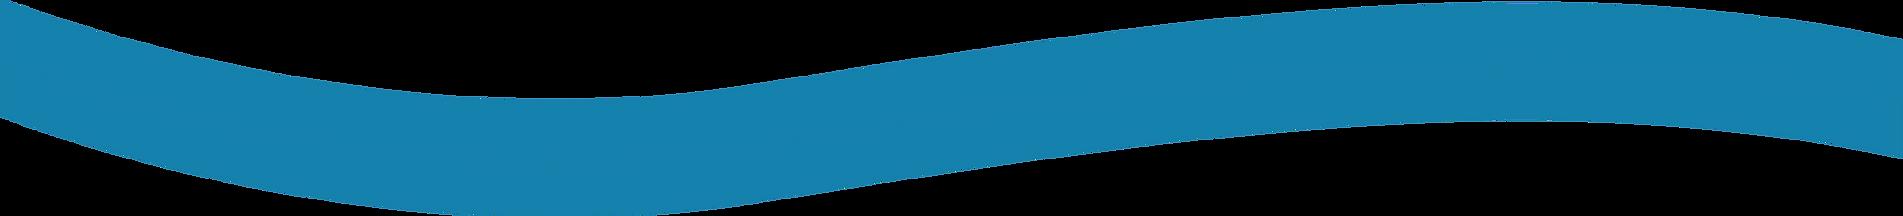 clipart-wave-divider-3-transparent_edite